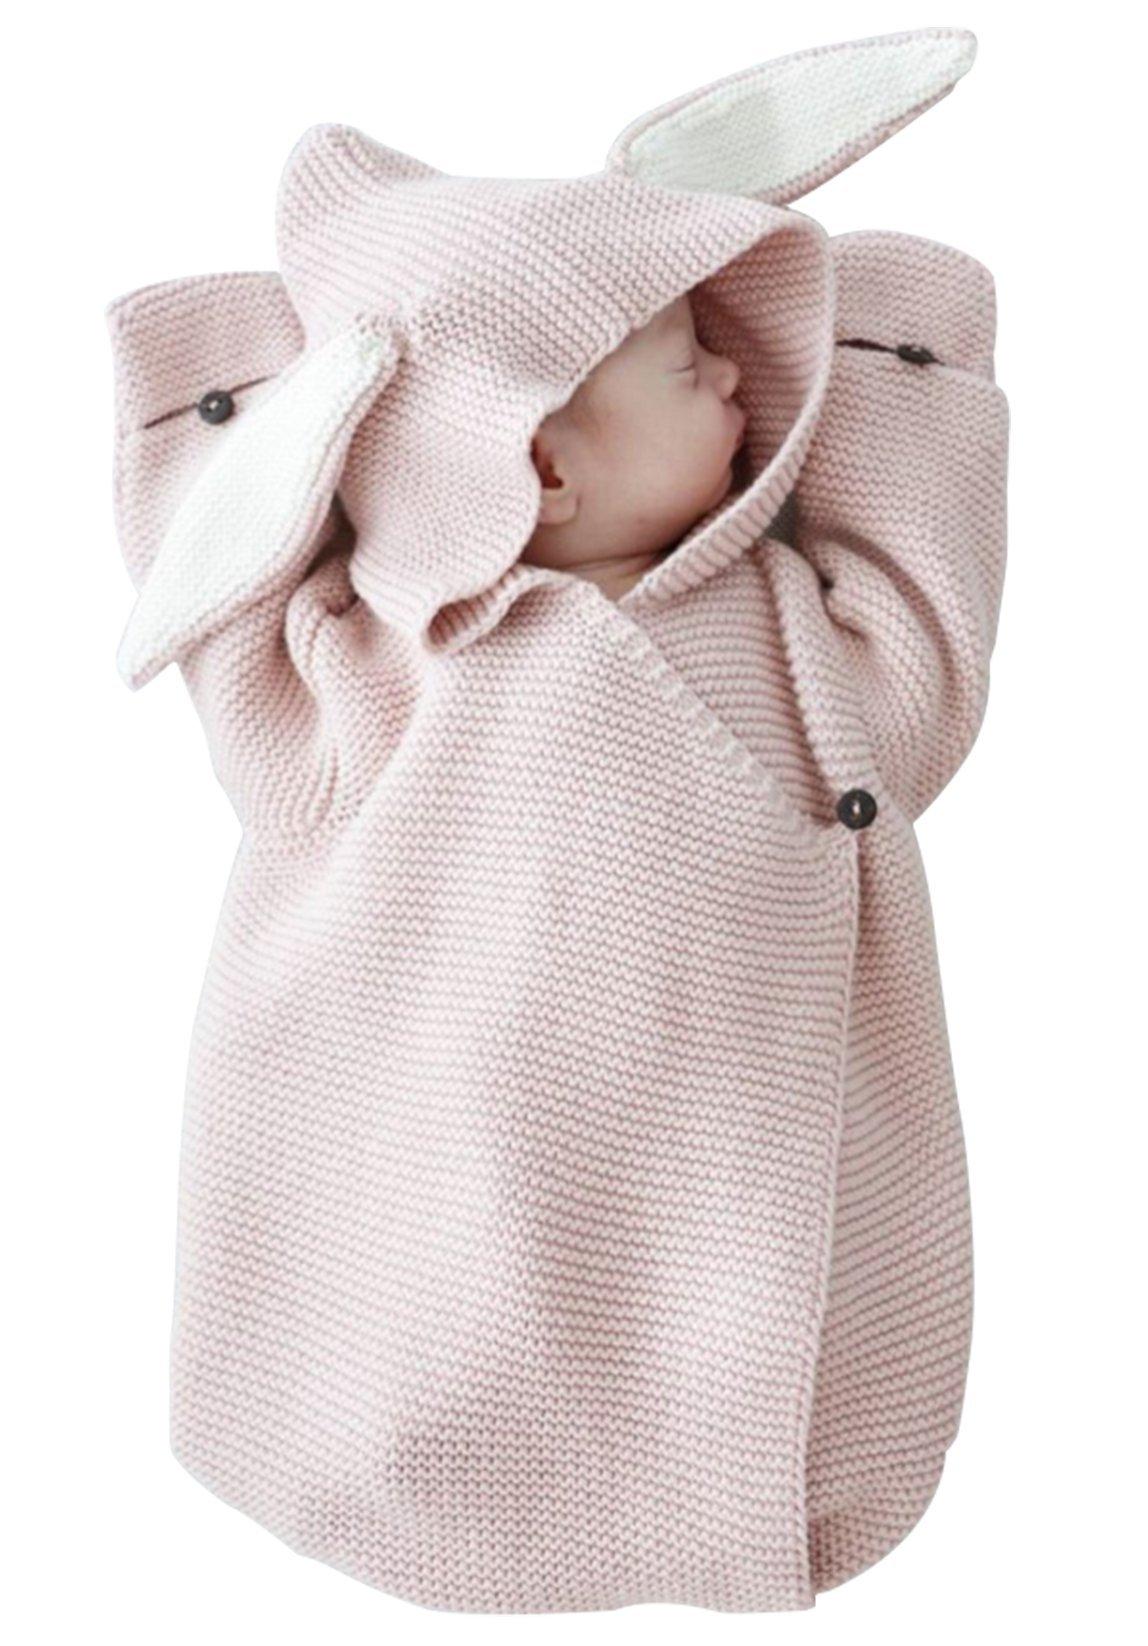 Newborn Boys Girls Cartoon Rabbit Ear Wool Knit Sweater Sleeper Bag Baby Hooded Warm Sleepsack Blanket (0-12Months, Pink)